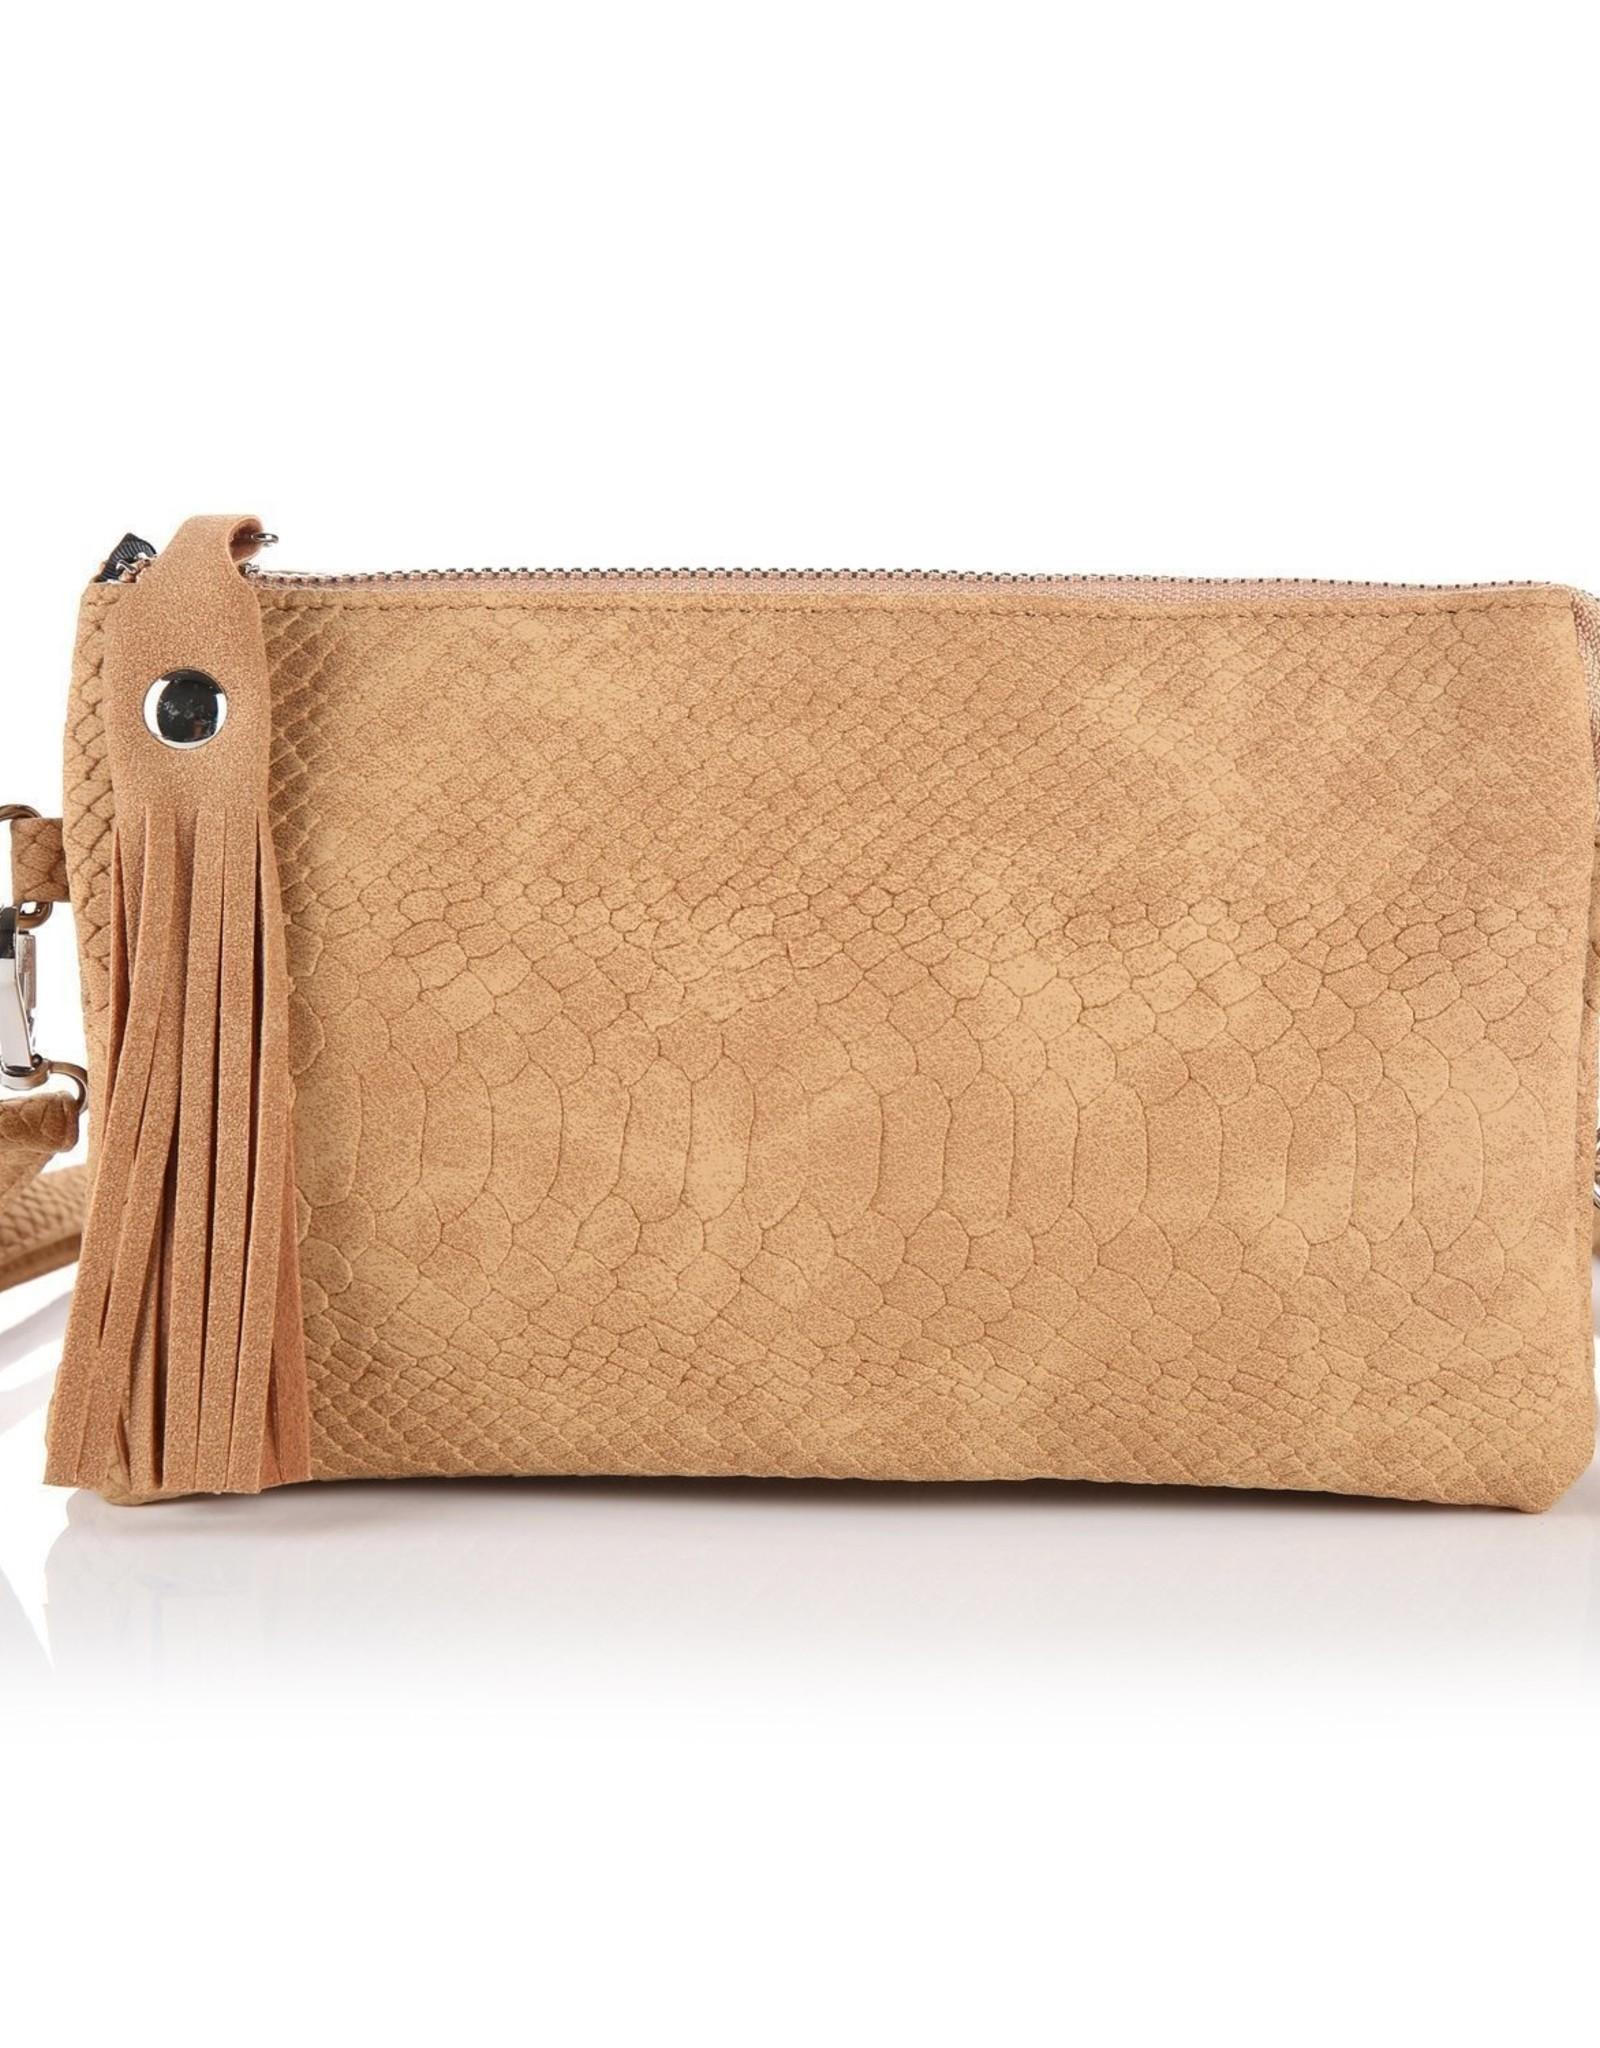 NEXT LVL Trendy Clutch, Crossbody bag